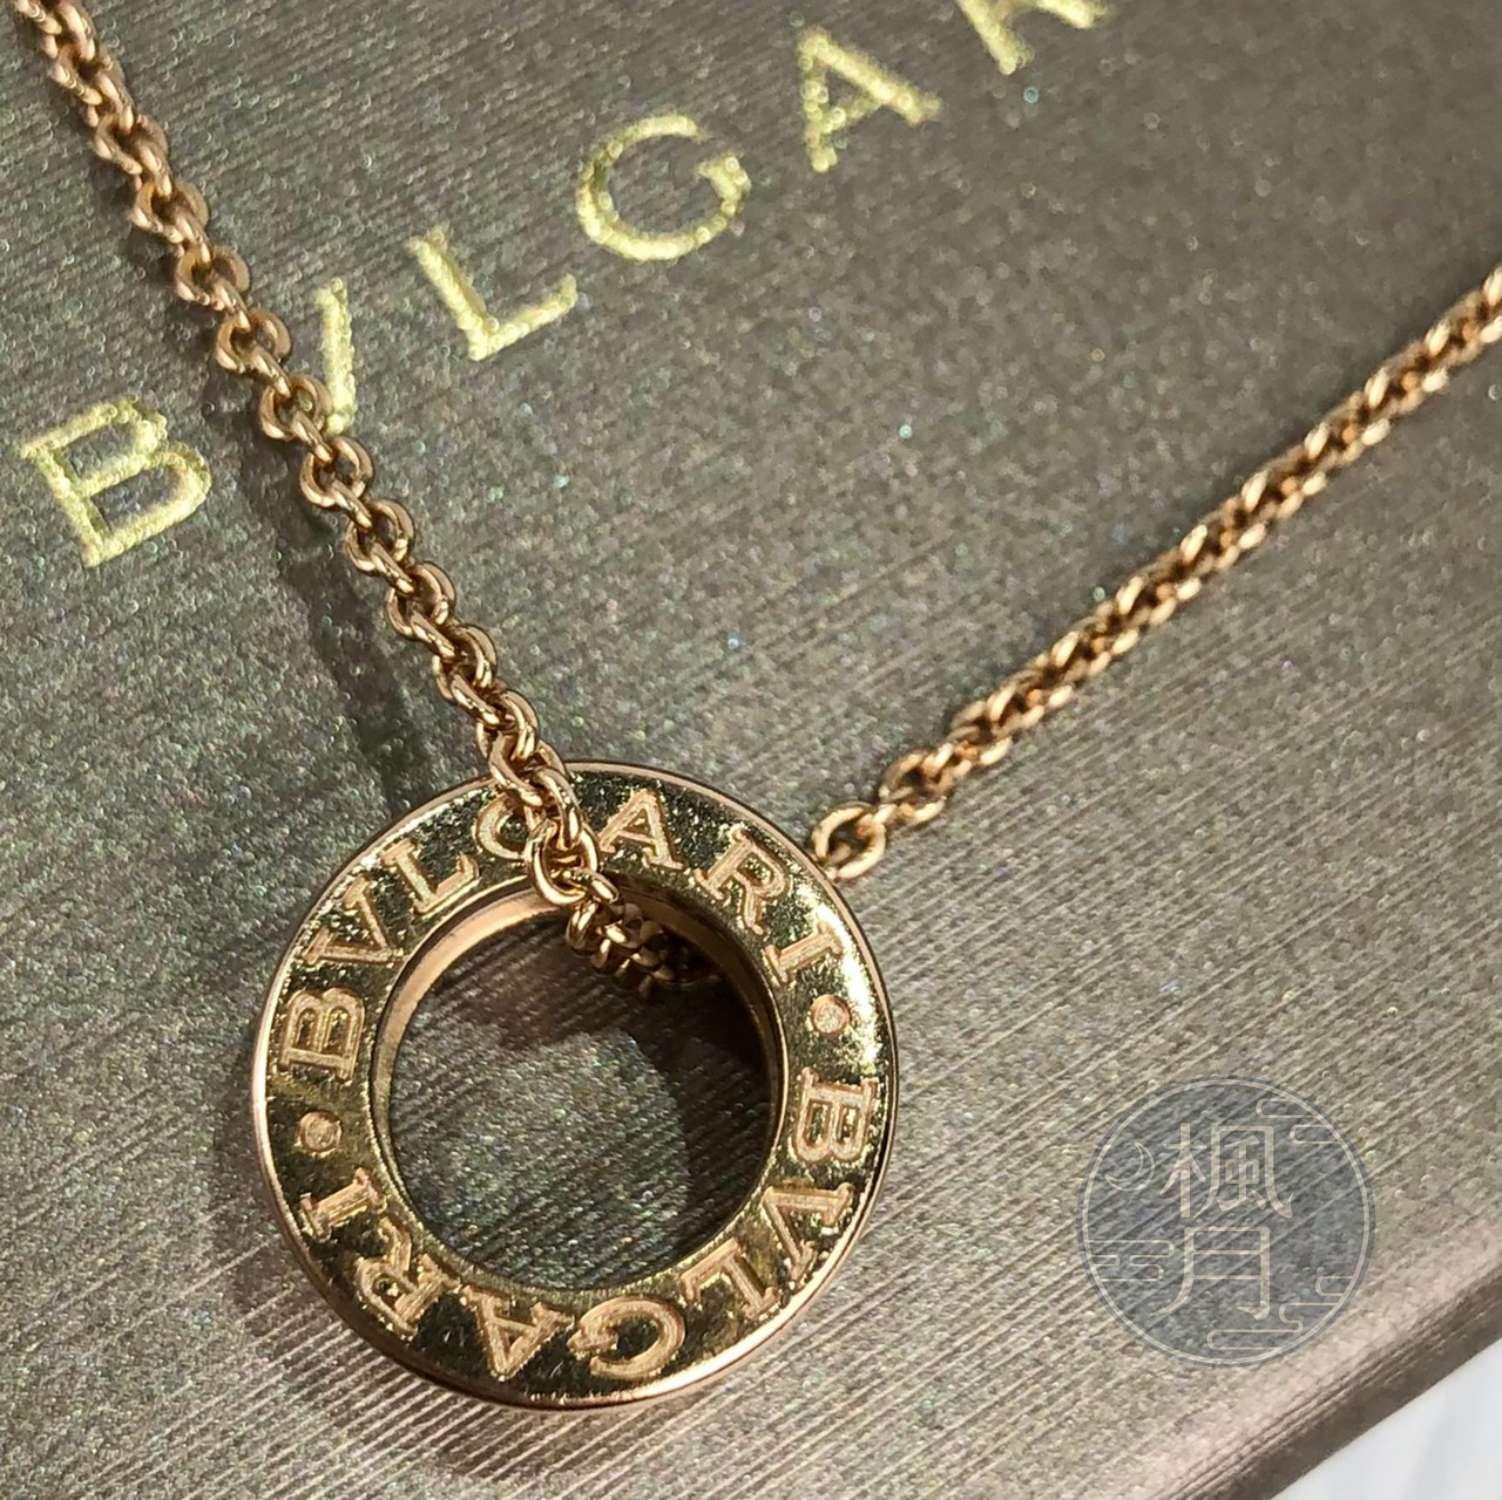 BRAND楓月 BVLGARI 寶格麗 K18 白陶瓷B.ZERO1項鍊 玫瑰金 墜鍊 綴飾 配飾 配件 飾品 飾物